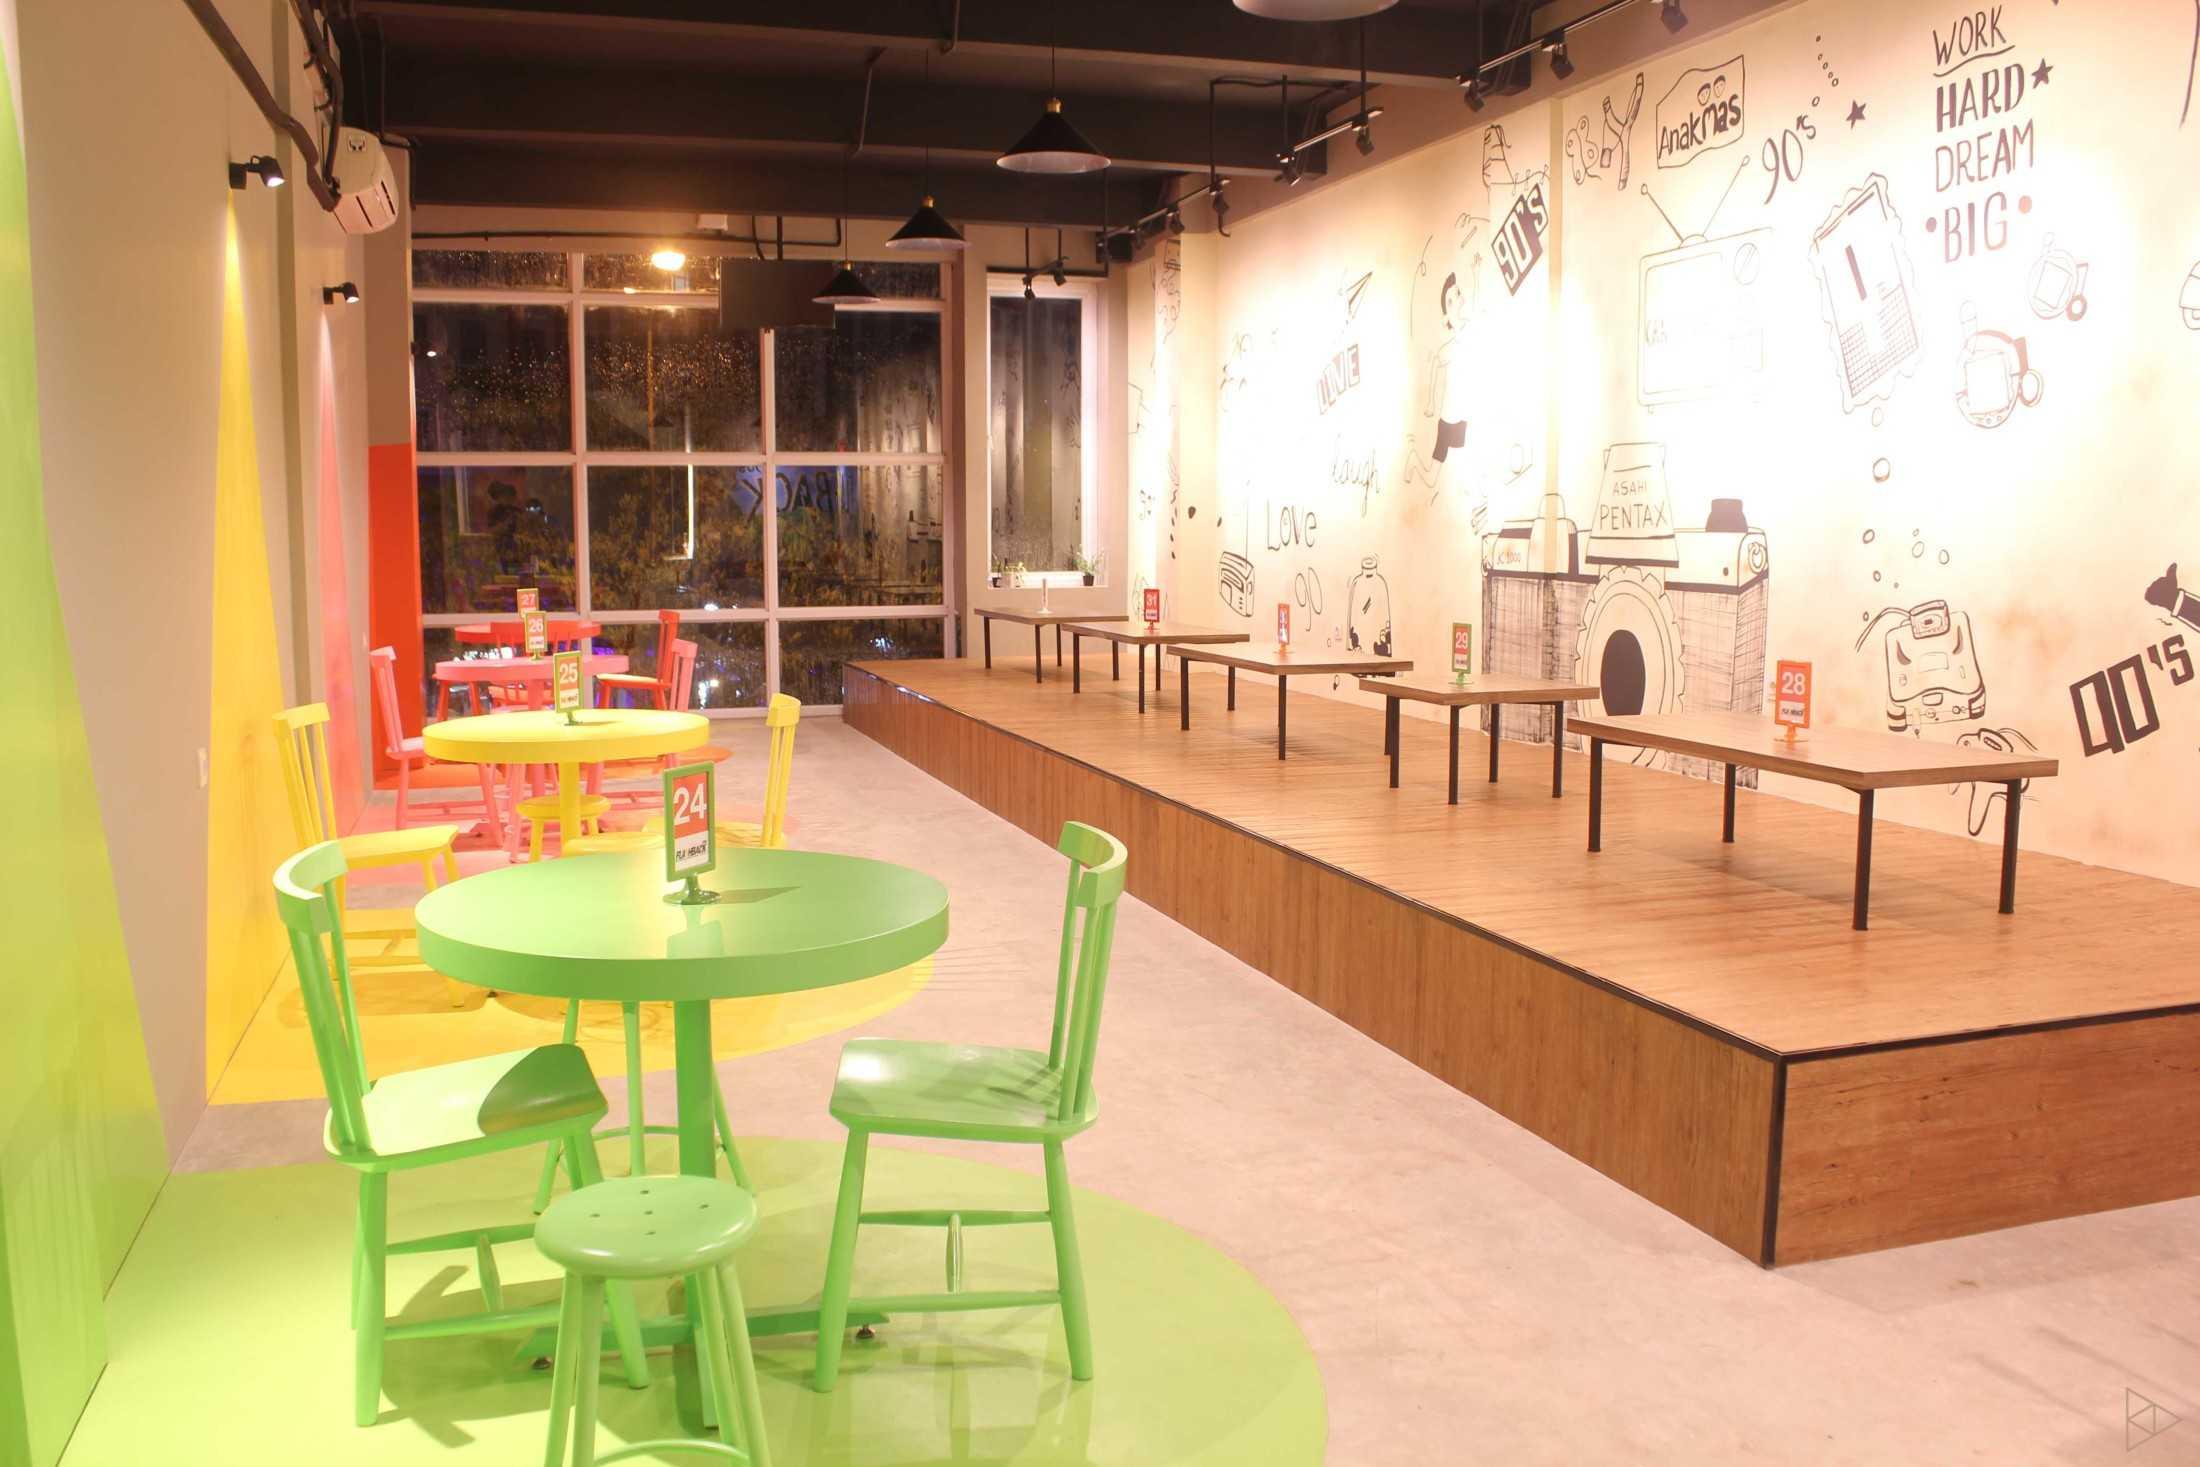 Ties Design & Build 90'S Flazback Cafe Klp. Indah, Kec. Tangerang, Kota Tangerang, Banten, Indonesia Klp. Indah, Kec. Tangerang, Kota Tangerang, Banten, Indonesia Eating Area 1 - 2Nd Floor  68655